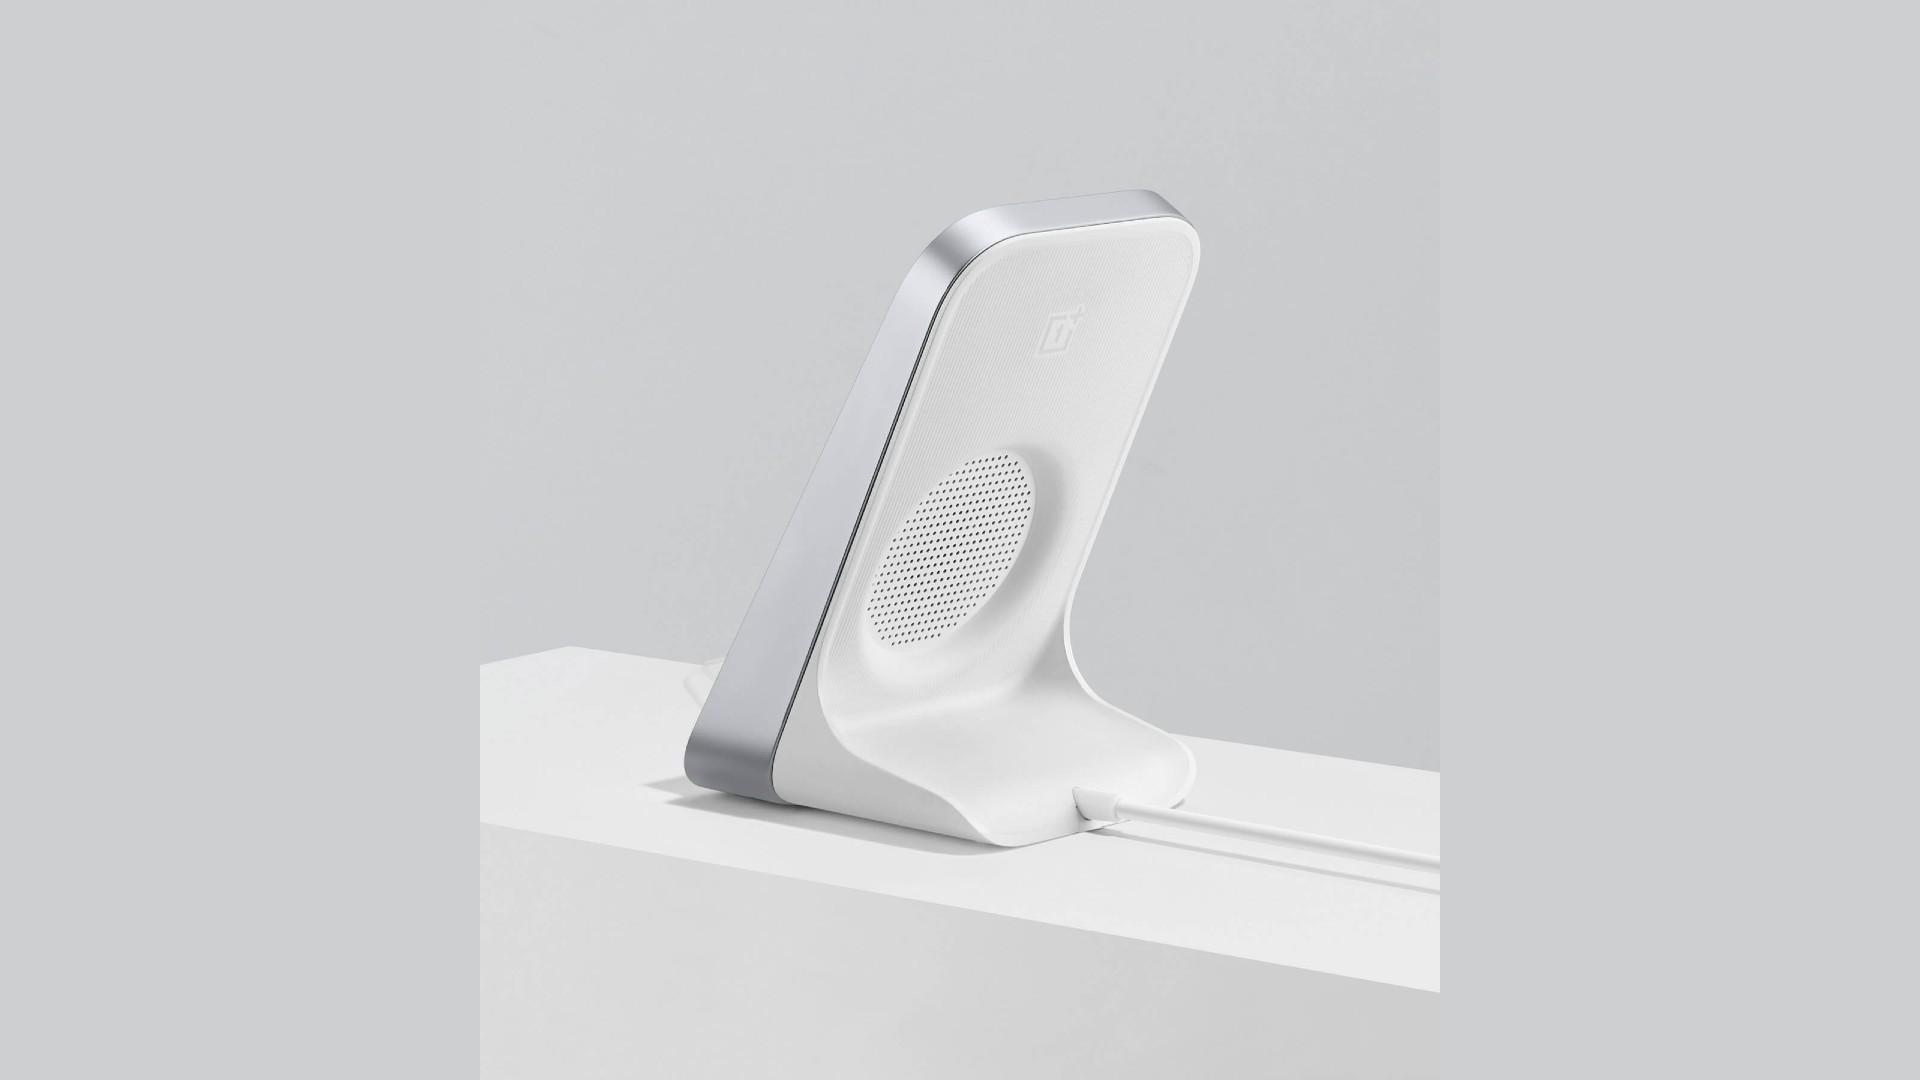 OnePlus 8 wireless charging dock